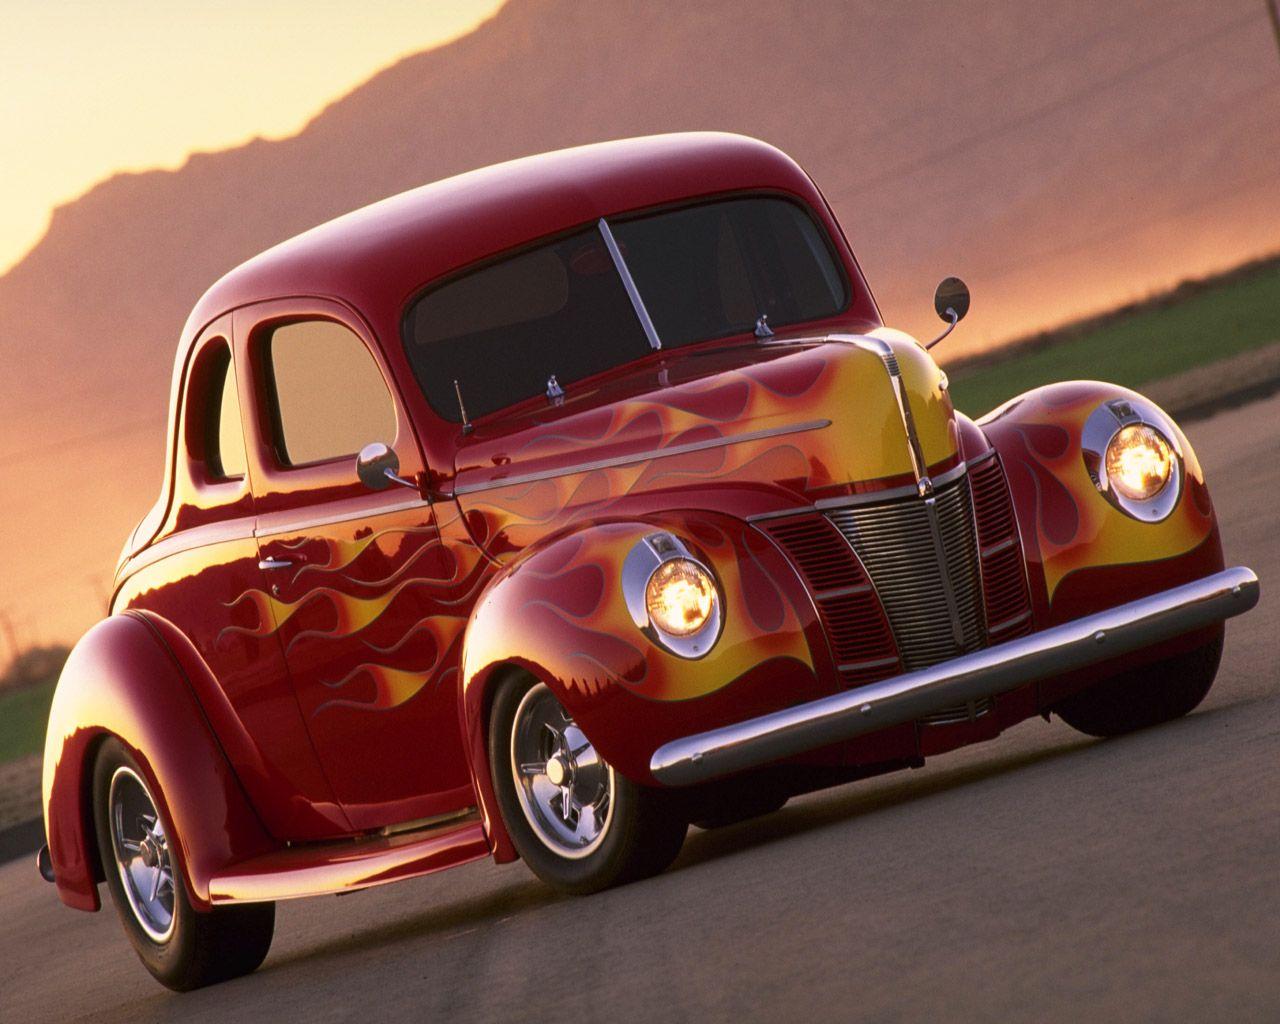 Hot+Rod   Cars Hot Rod Classic Cars Widescreen Fresh New HD ...